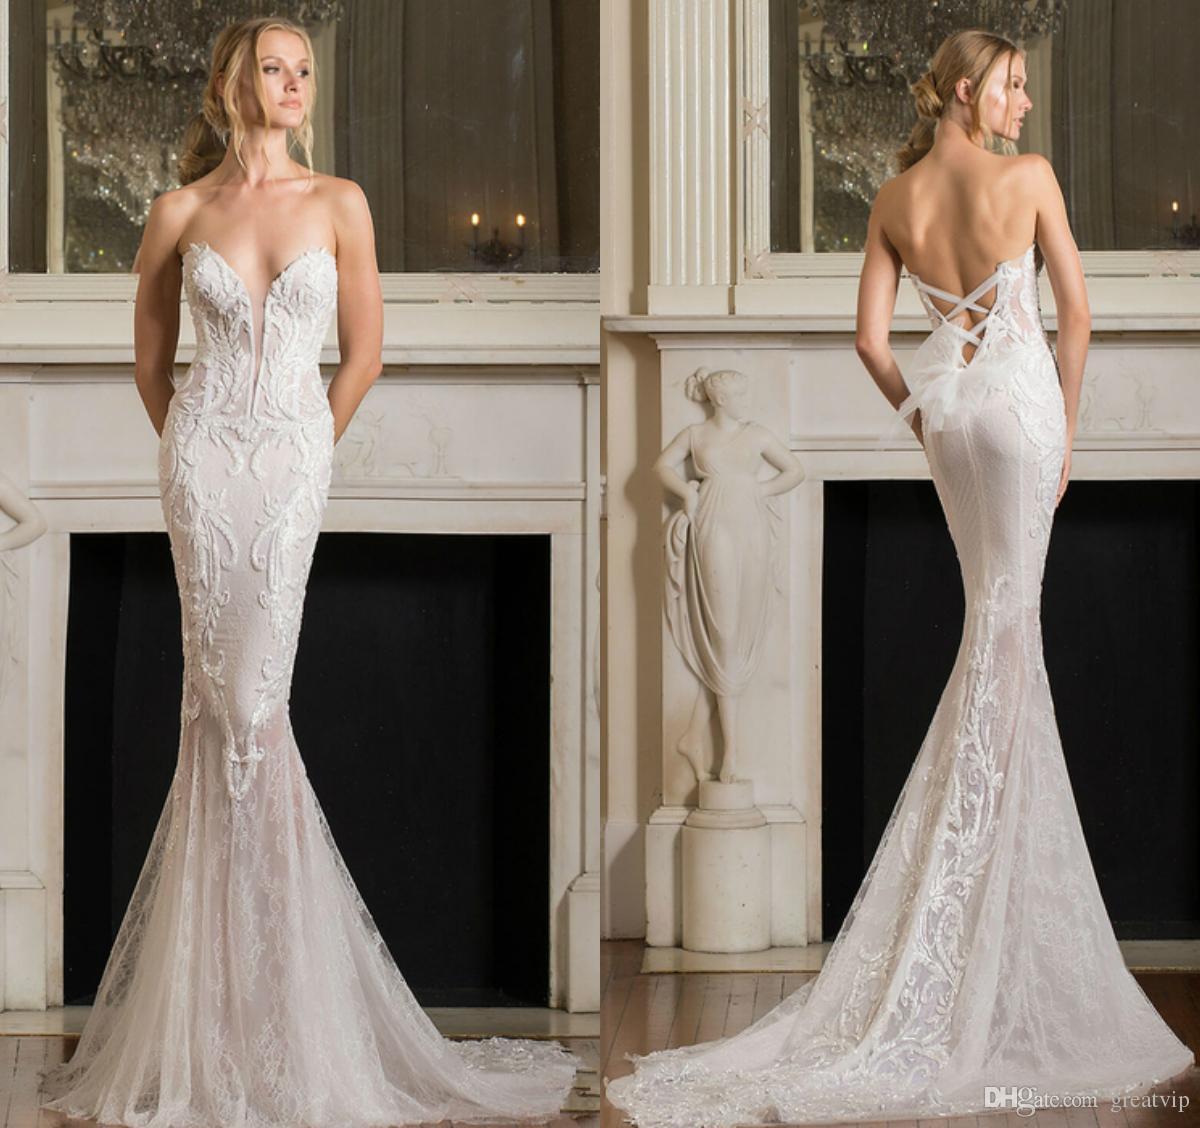 Pnina Tornai 2019 Mermaid Wedding Dresses V Neck Backless Lace 3D Applique Sequins Long Sleeve Sweep Train Beach Bridal Gowns Robe De Mariée